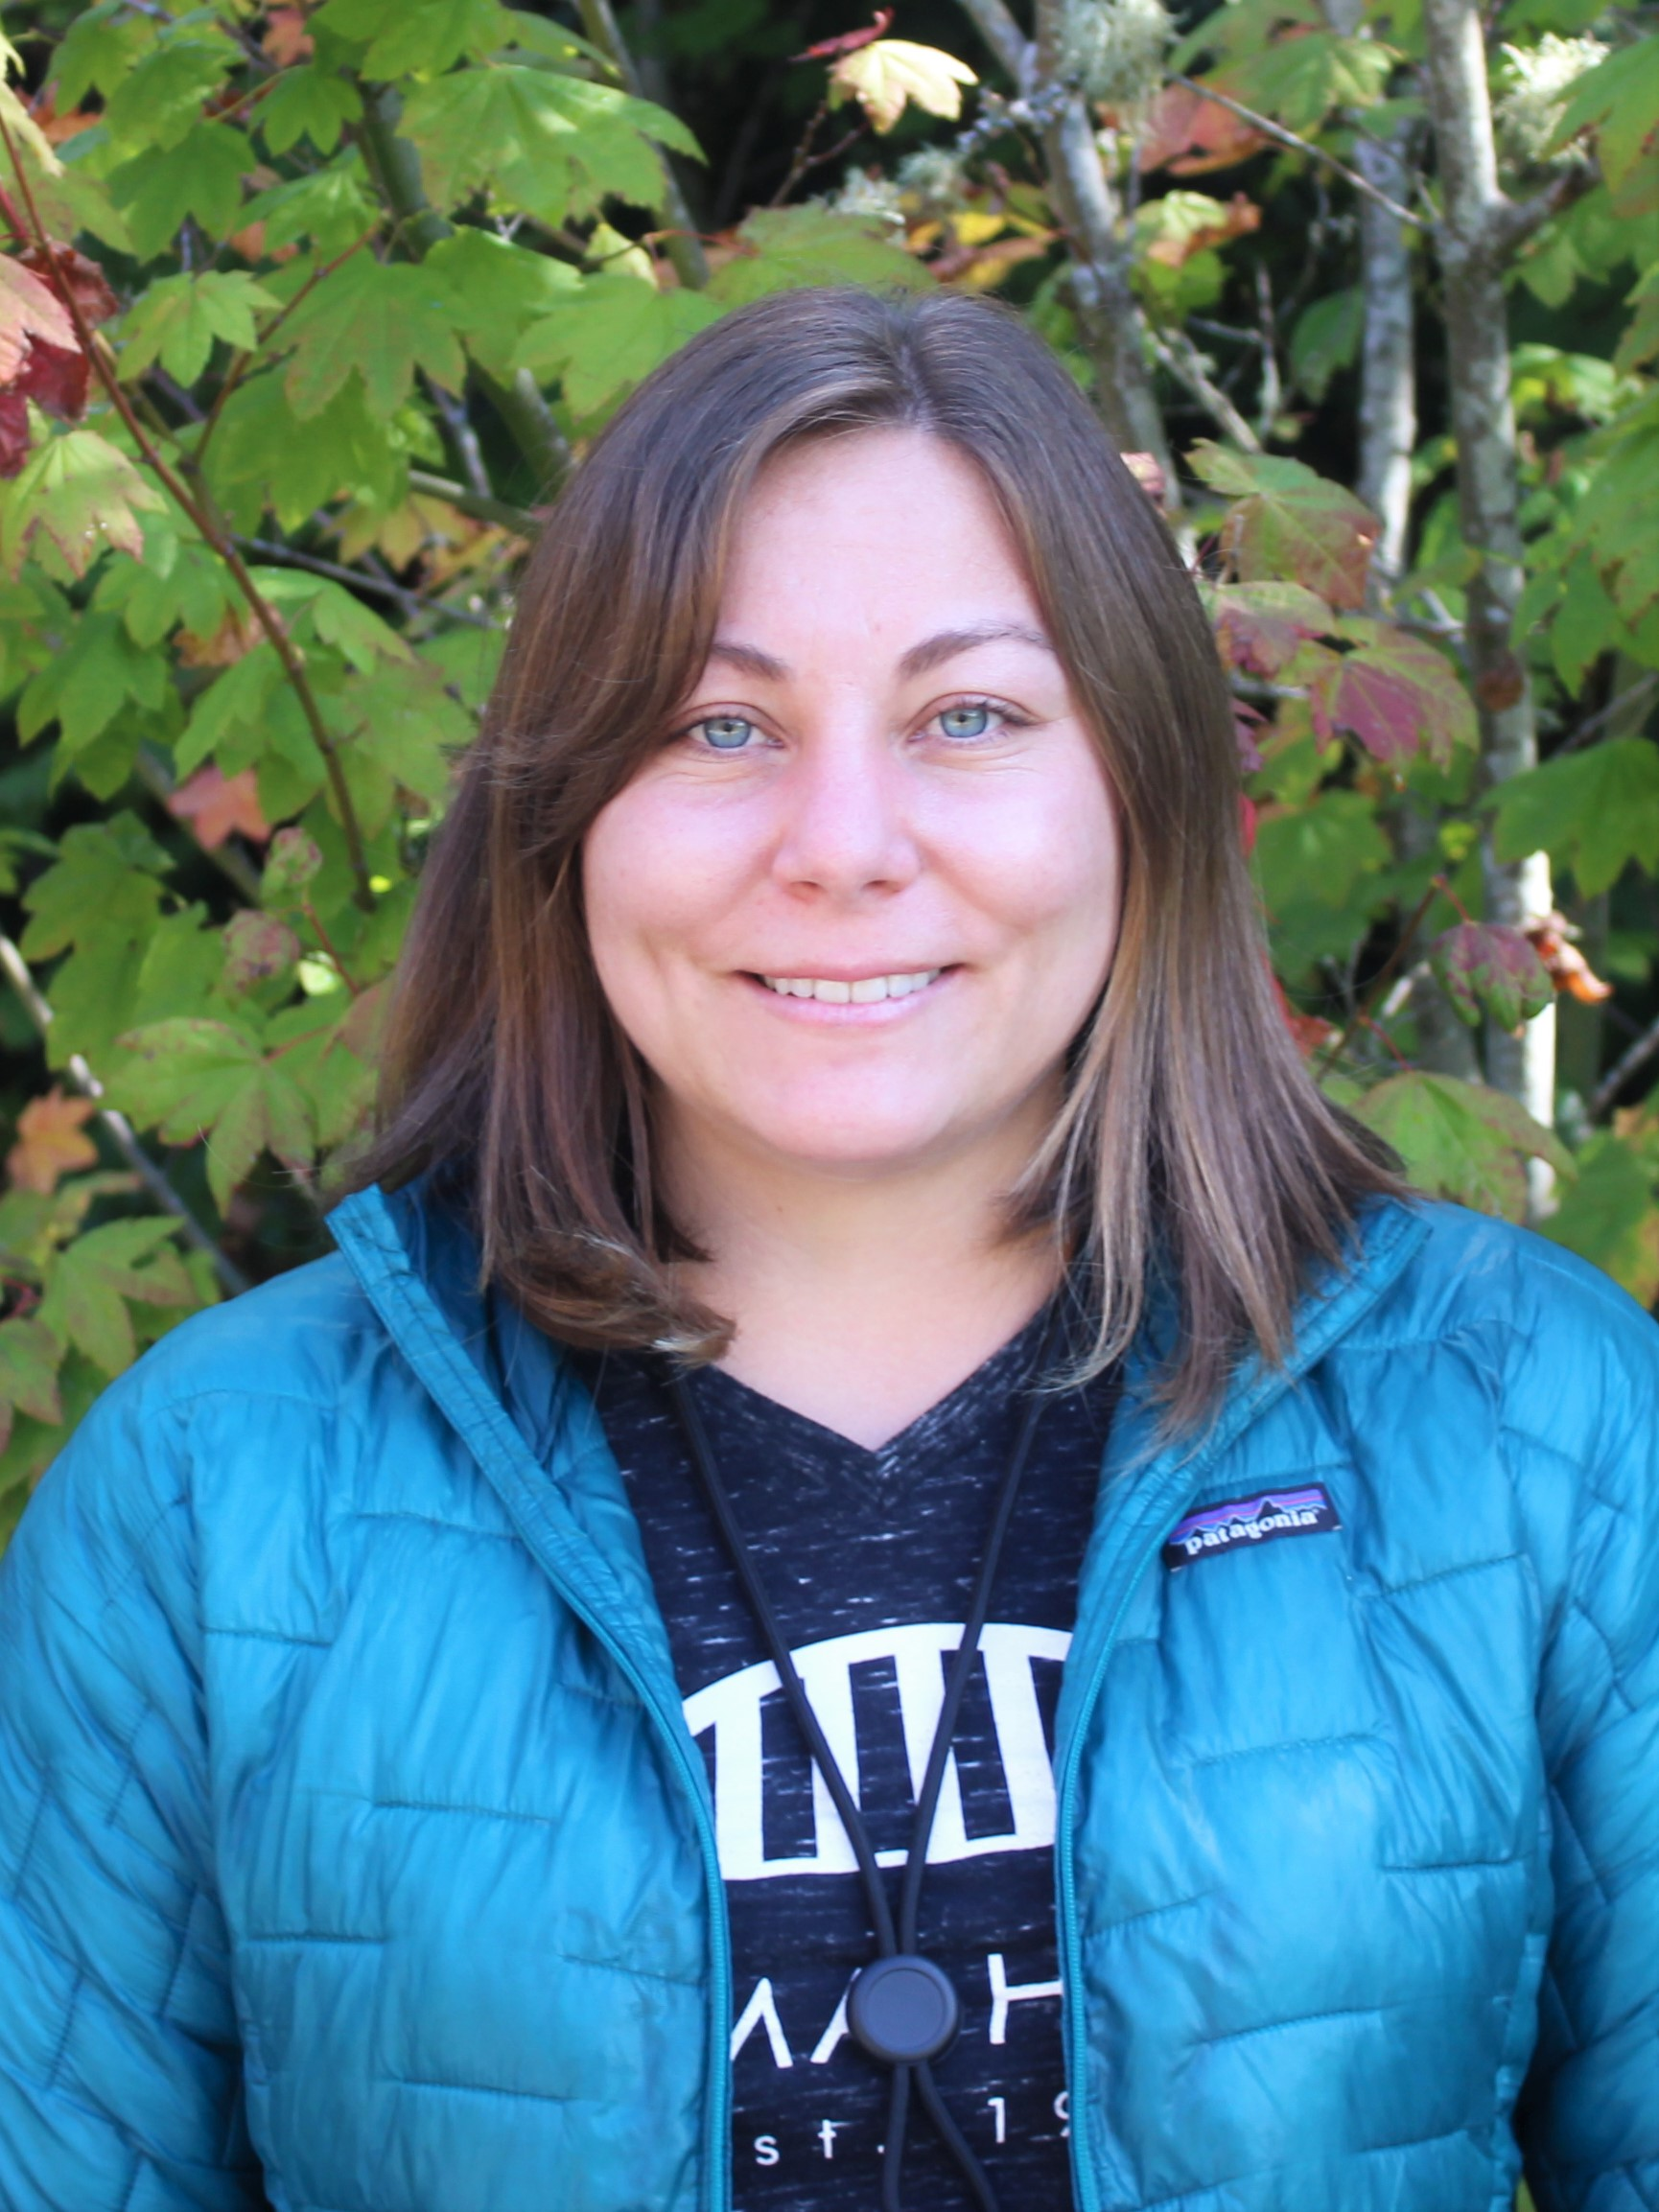 IslandWood Graduate Program student Hanna Jones